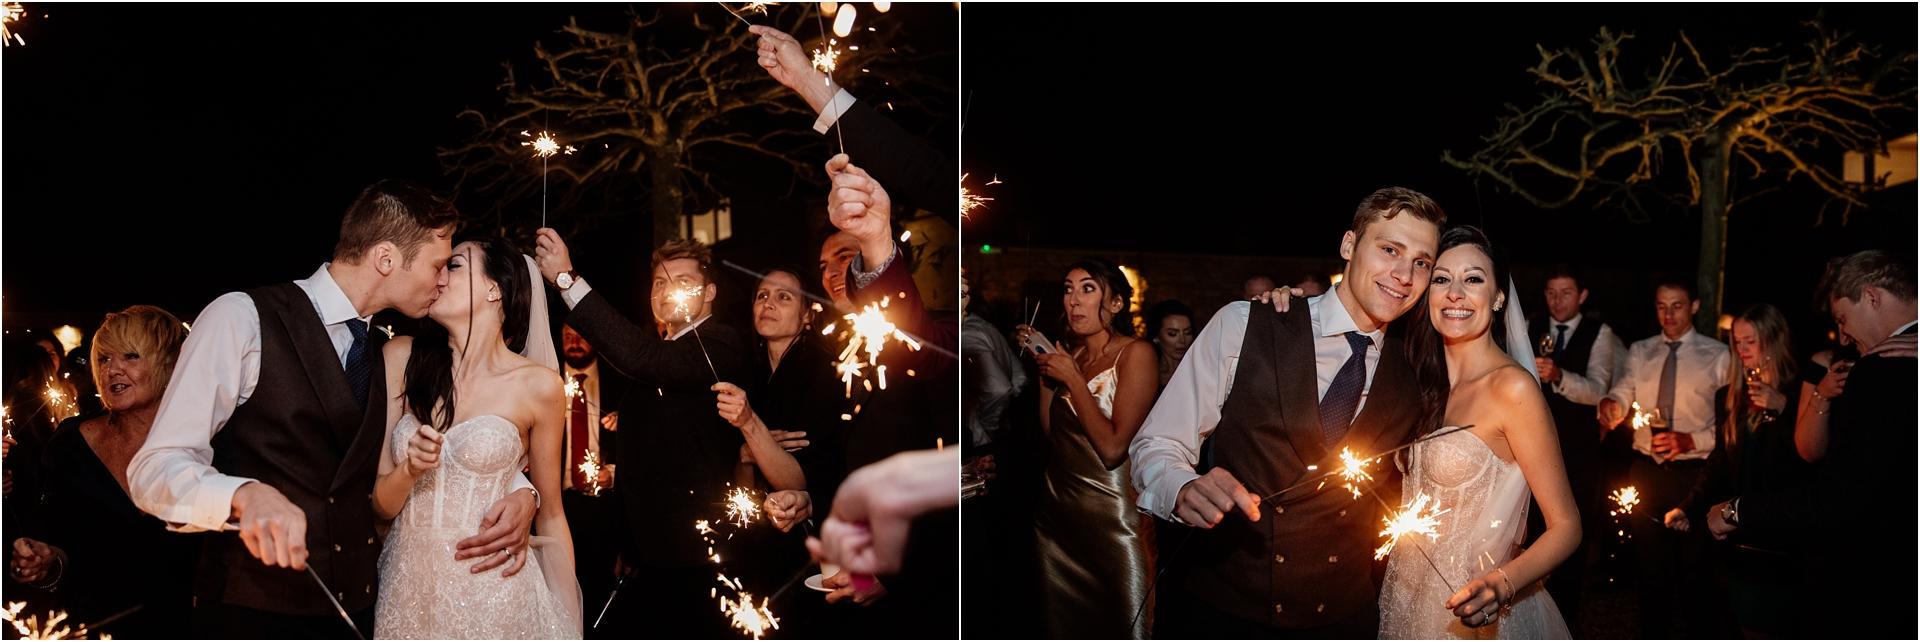 sparklers at Lapstone Barn wedding